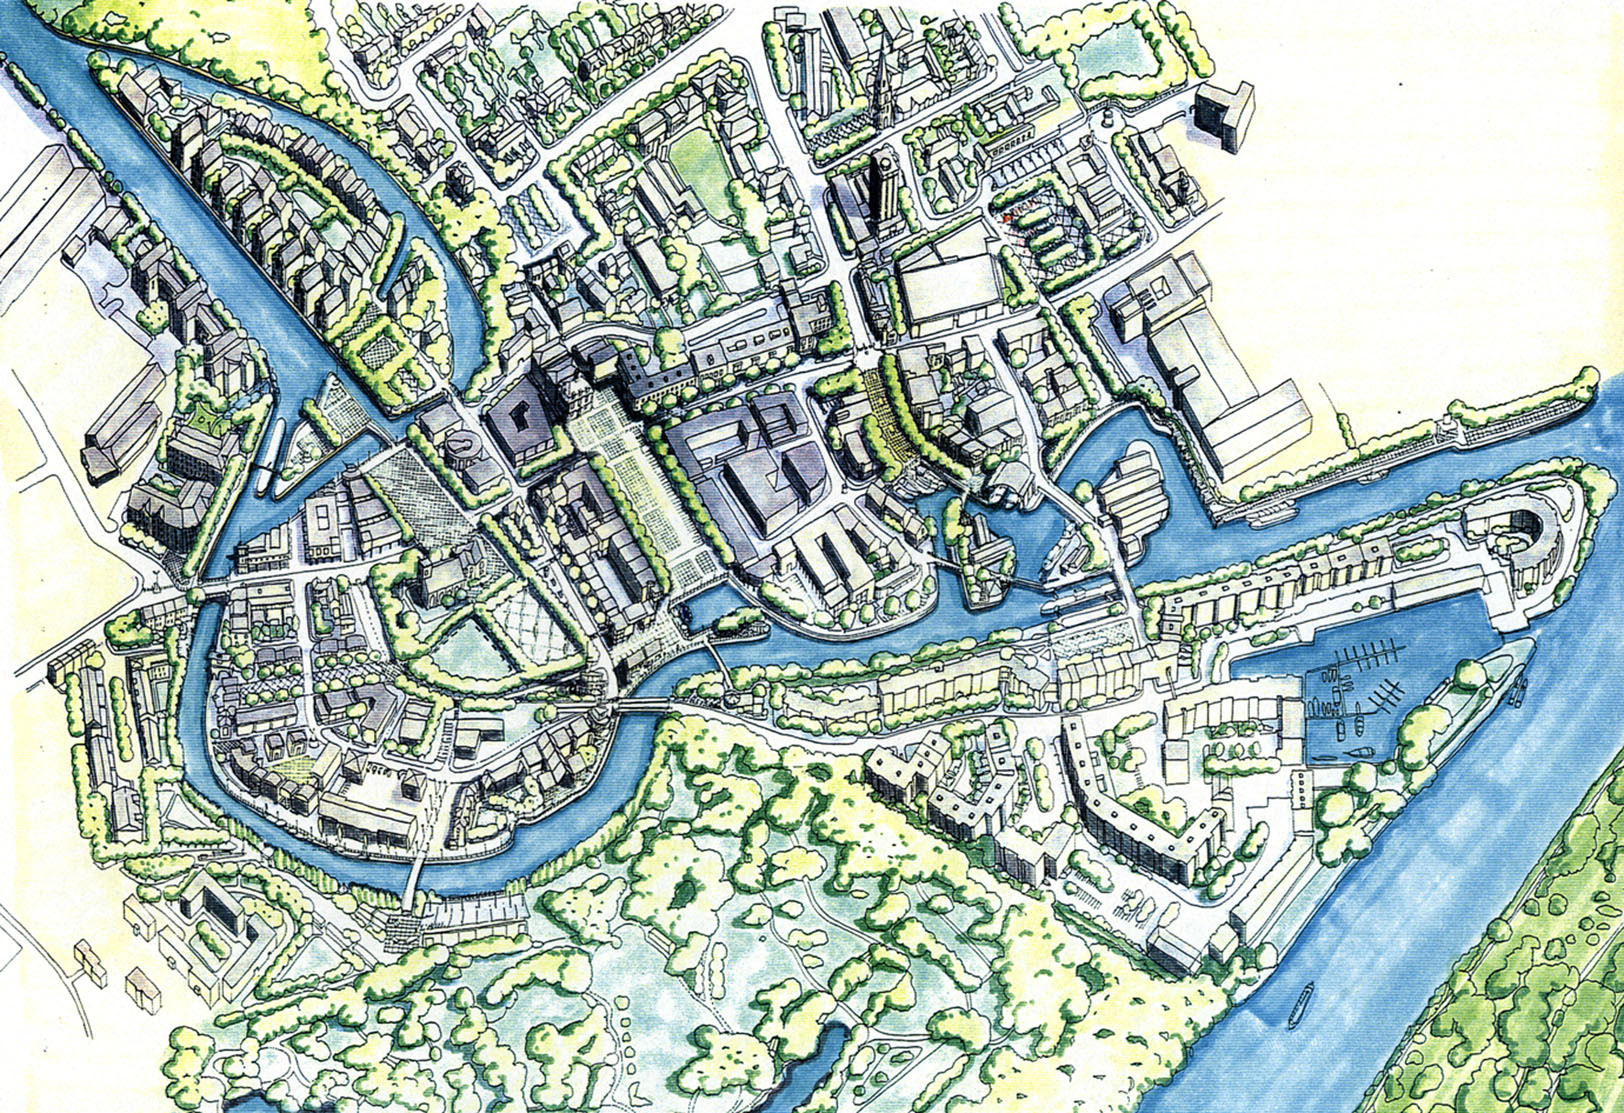 Brentford Urban Design Framework